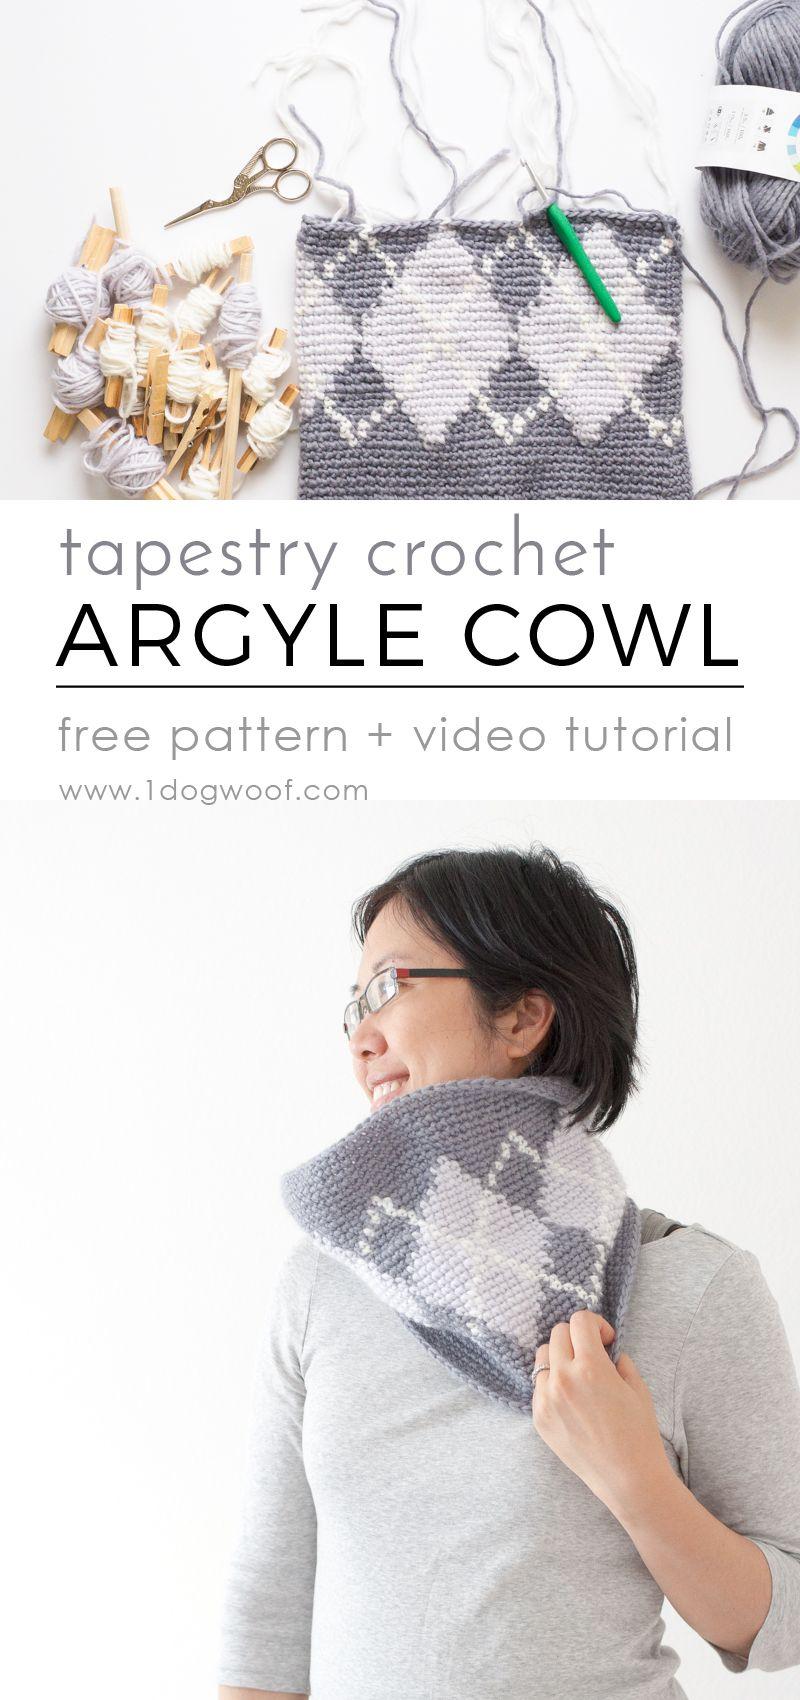 Silverstone Argyle Cowl Using Tapestry Crochet | Pinterest ...